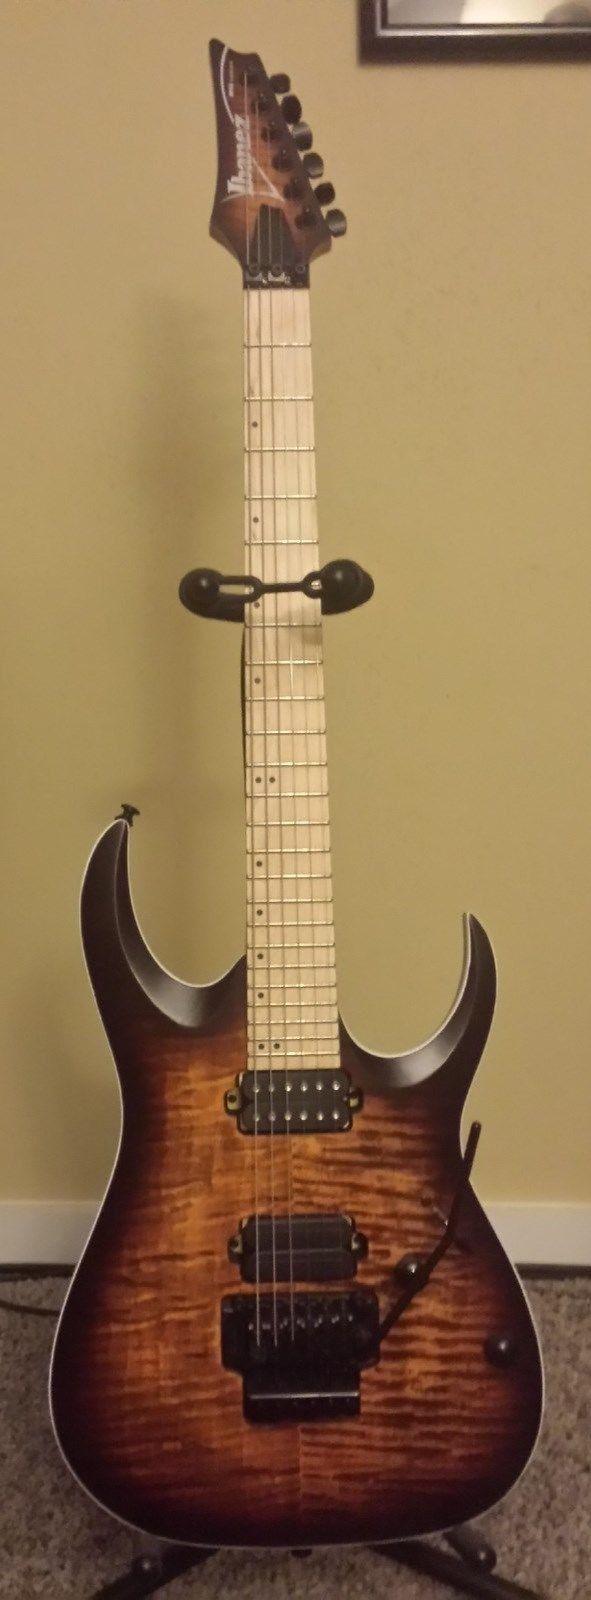 Ibanez RGAR42MFMT Electric Guitar Flat Dragon Eye Burst W